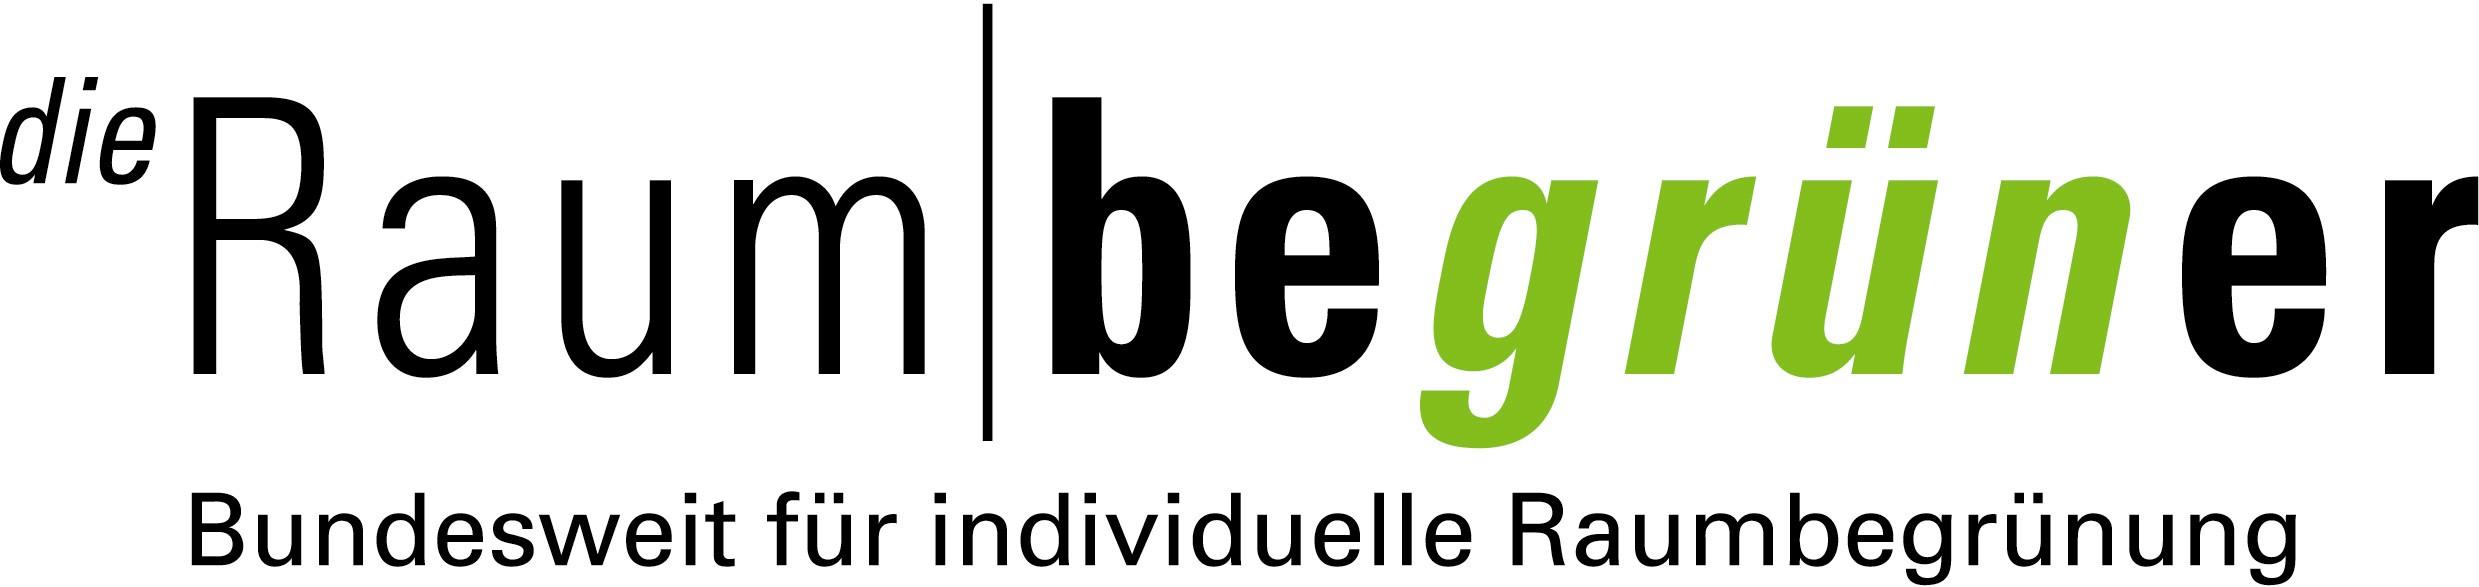 Logo 'die Raumbegrüner' - Bundesweite Raumbegrünung